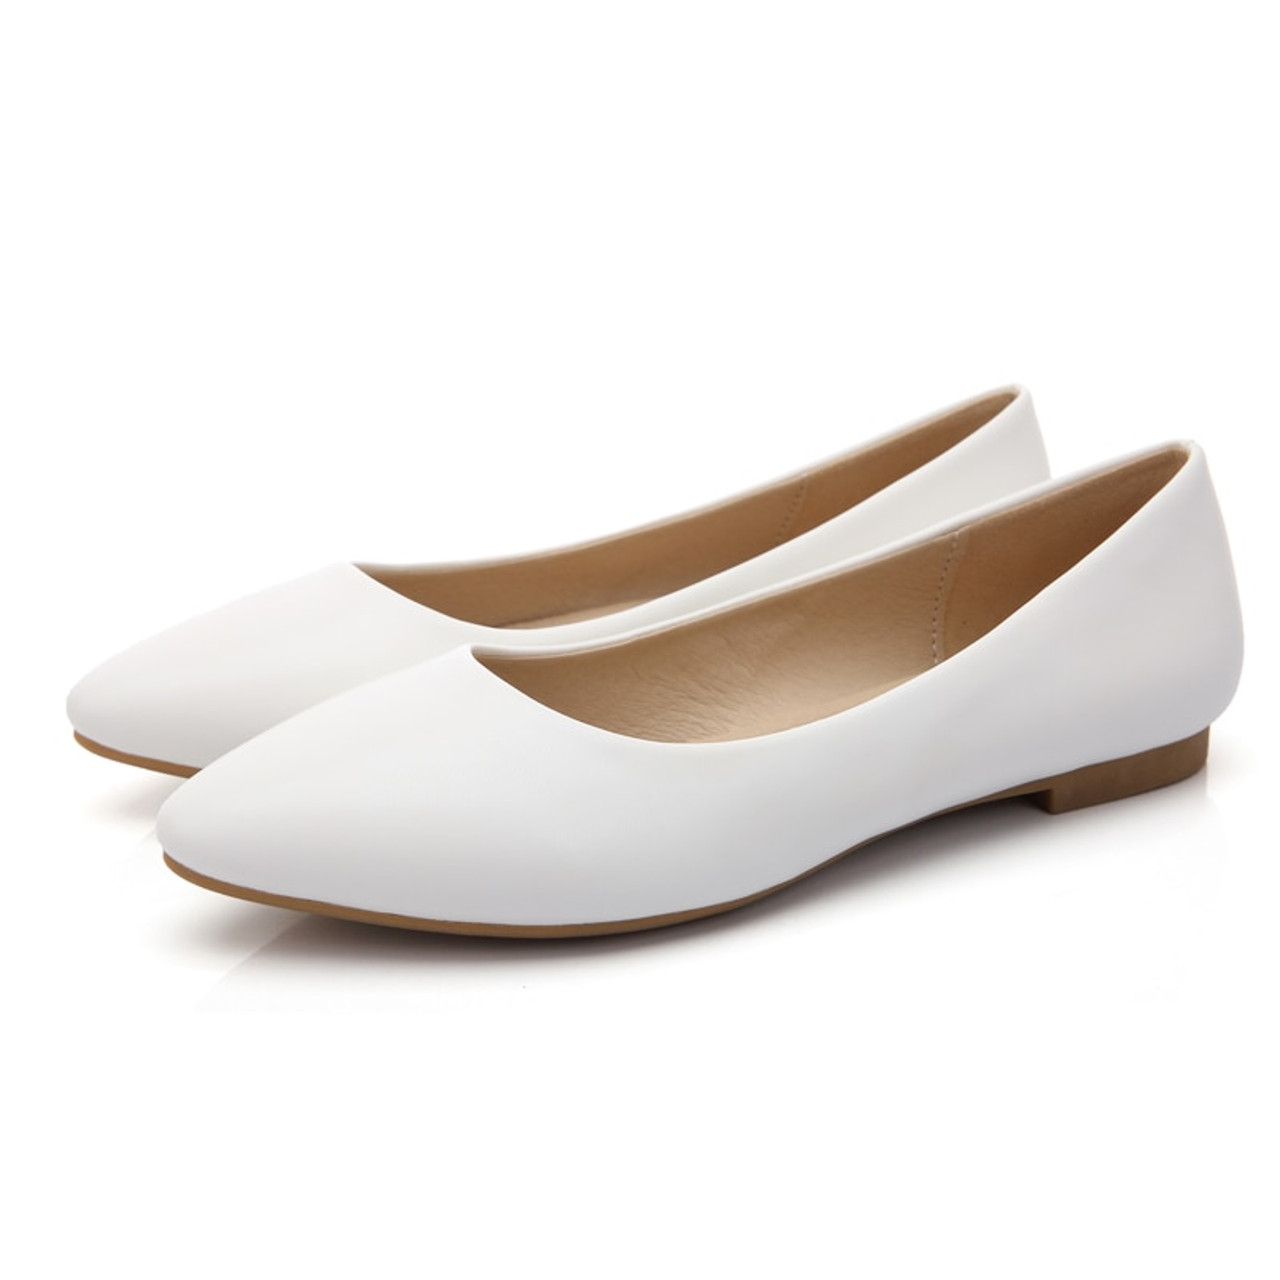 YALNN 2019 New Women Shoes Flat Leather